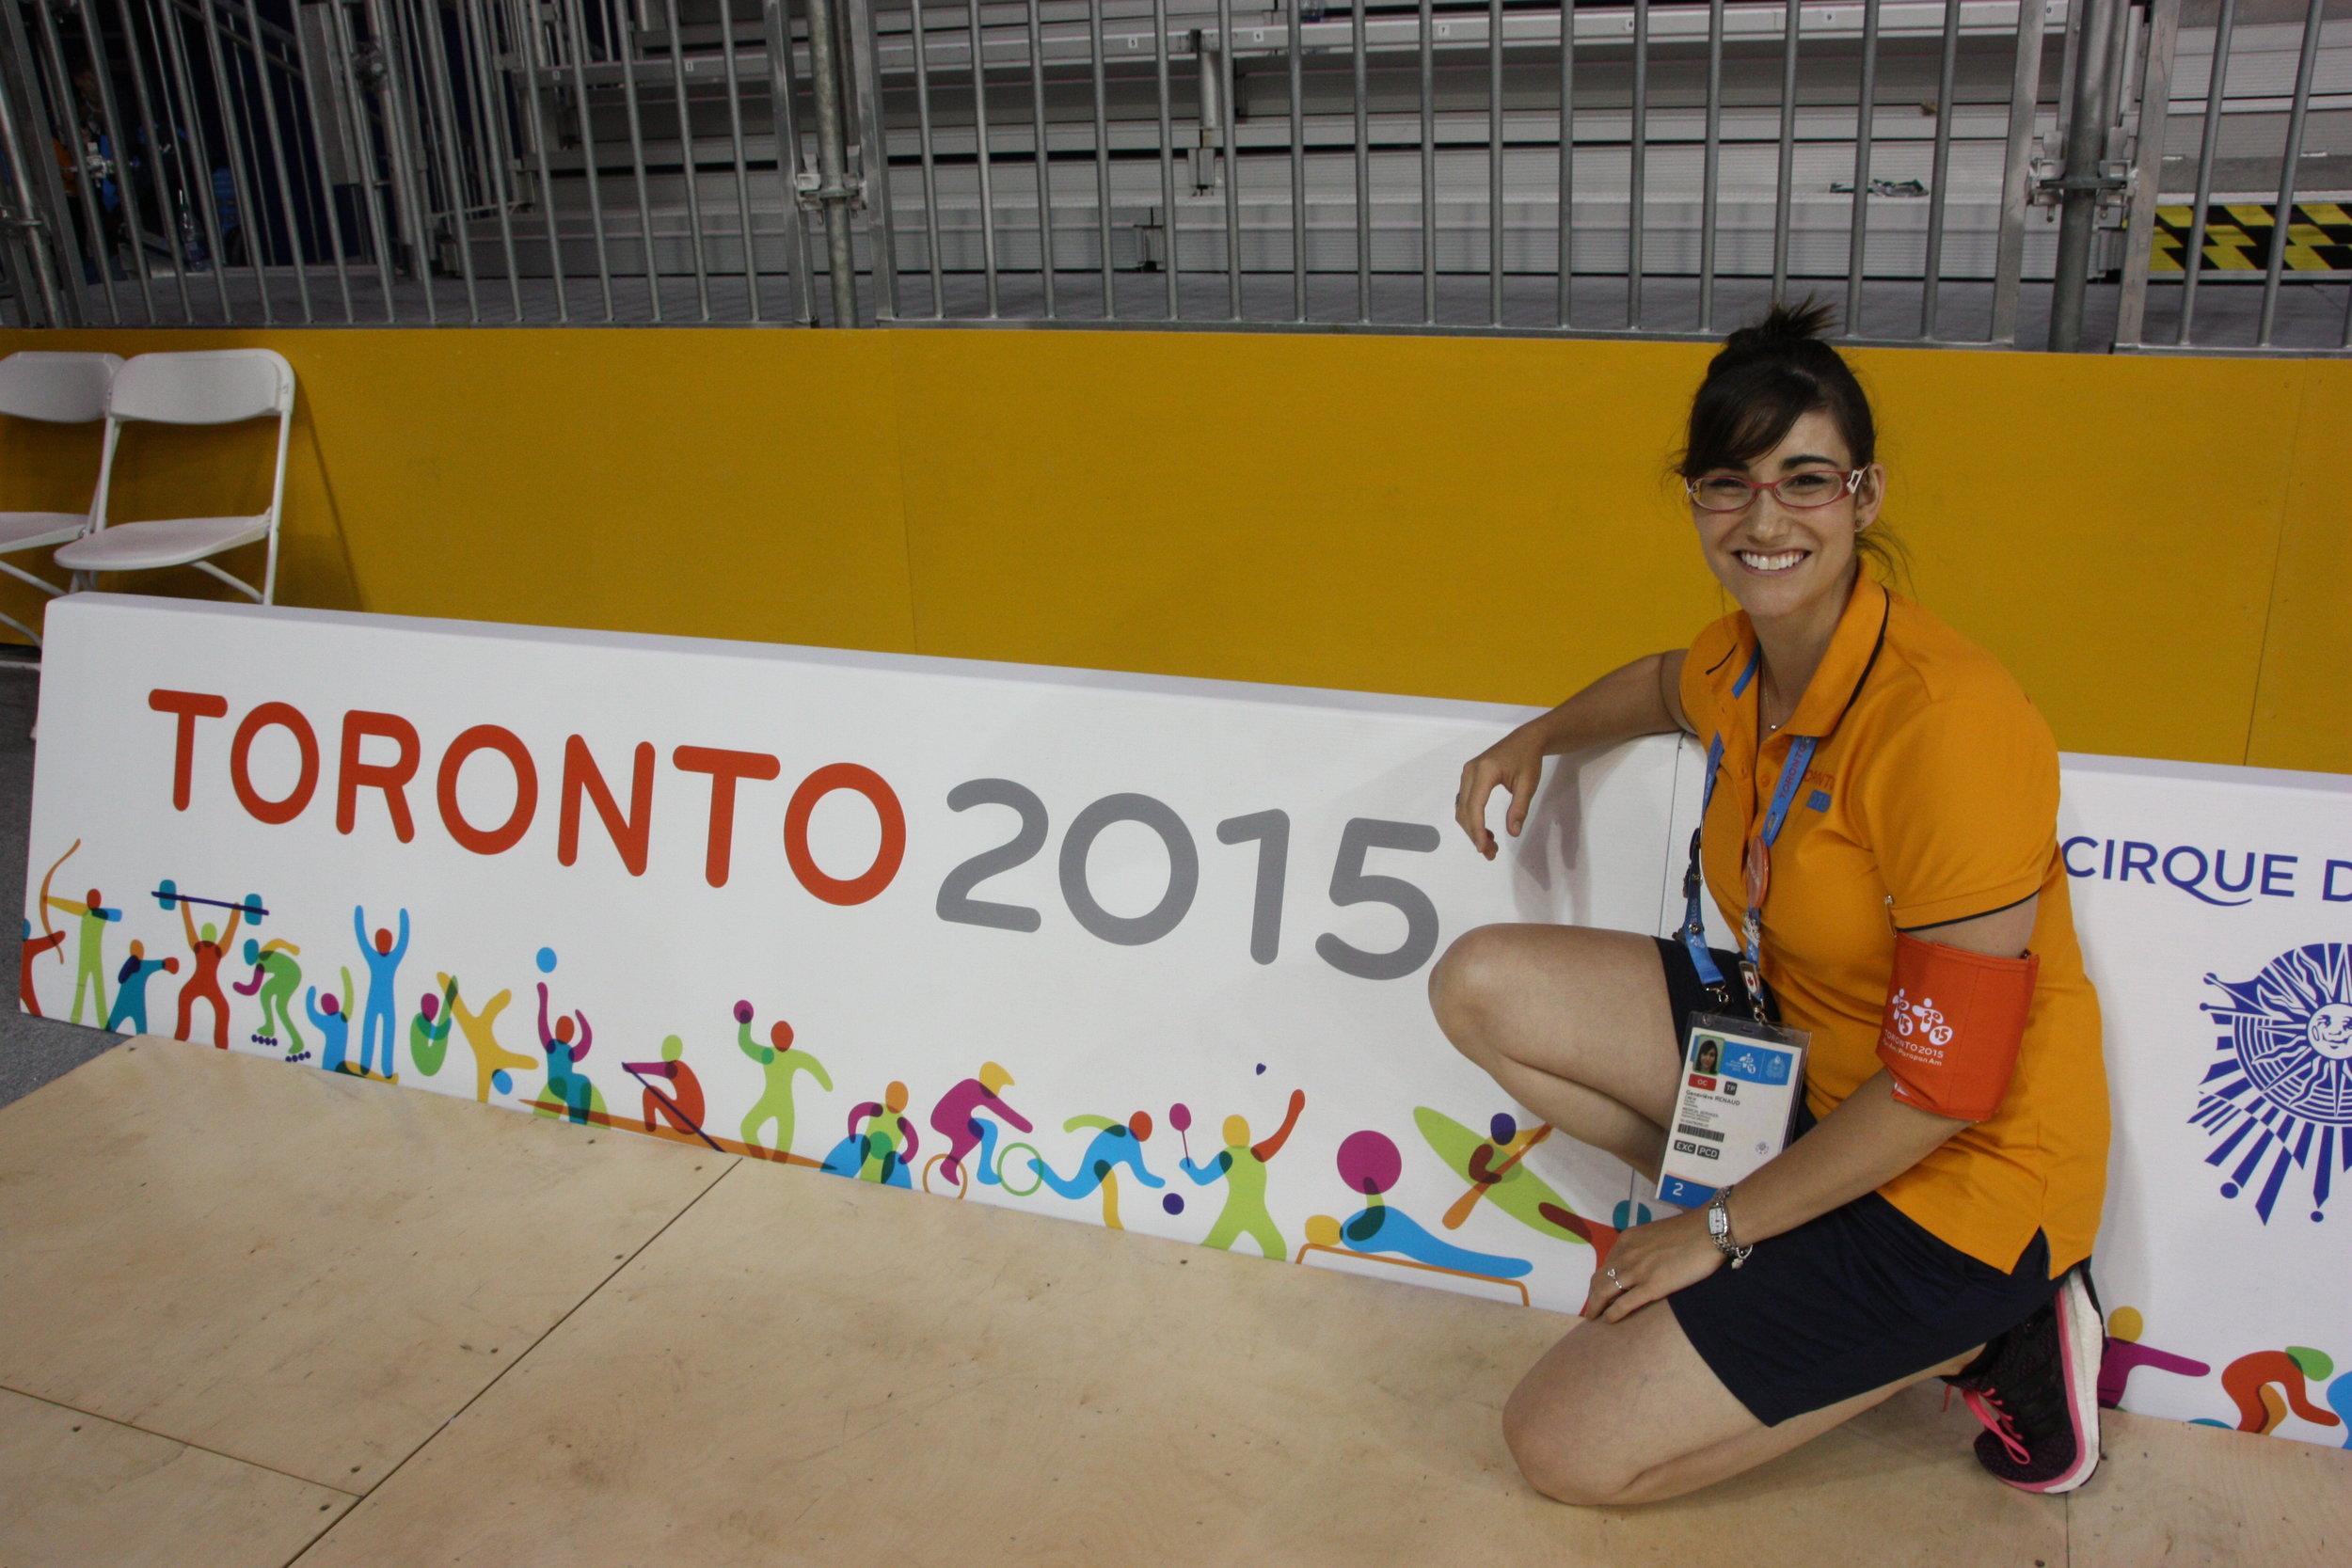 2015 Pan Am Games - Toronto sign horizontal.JPG